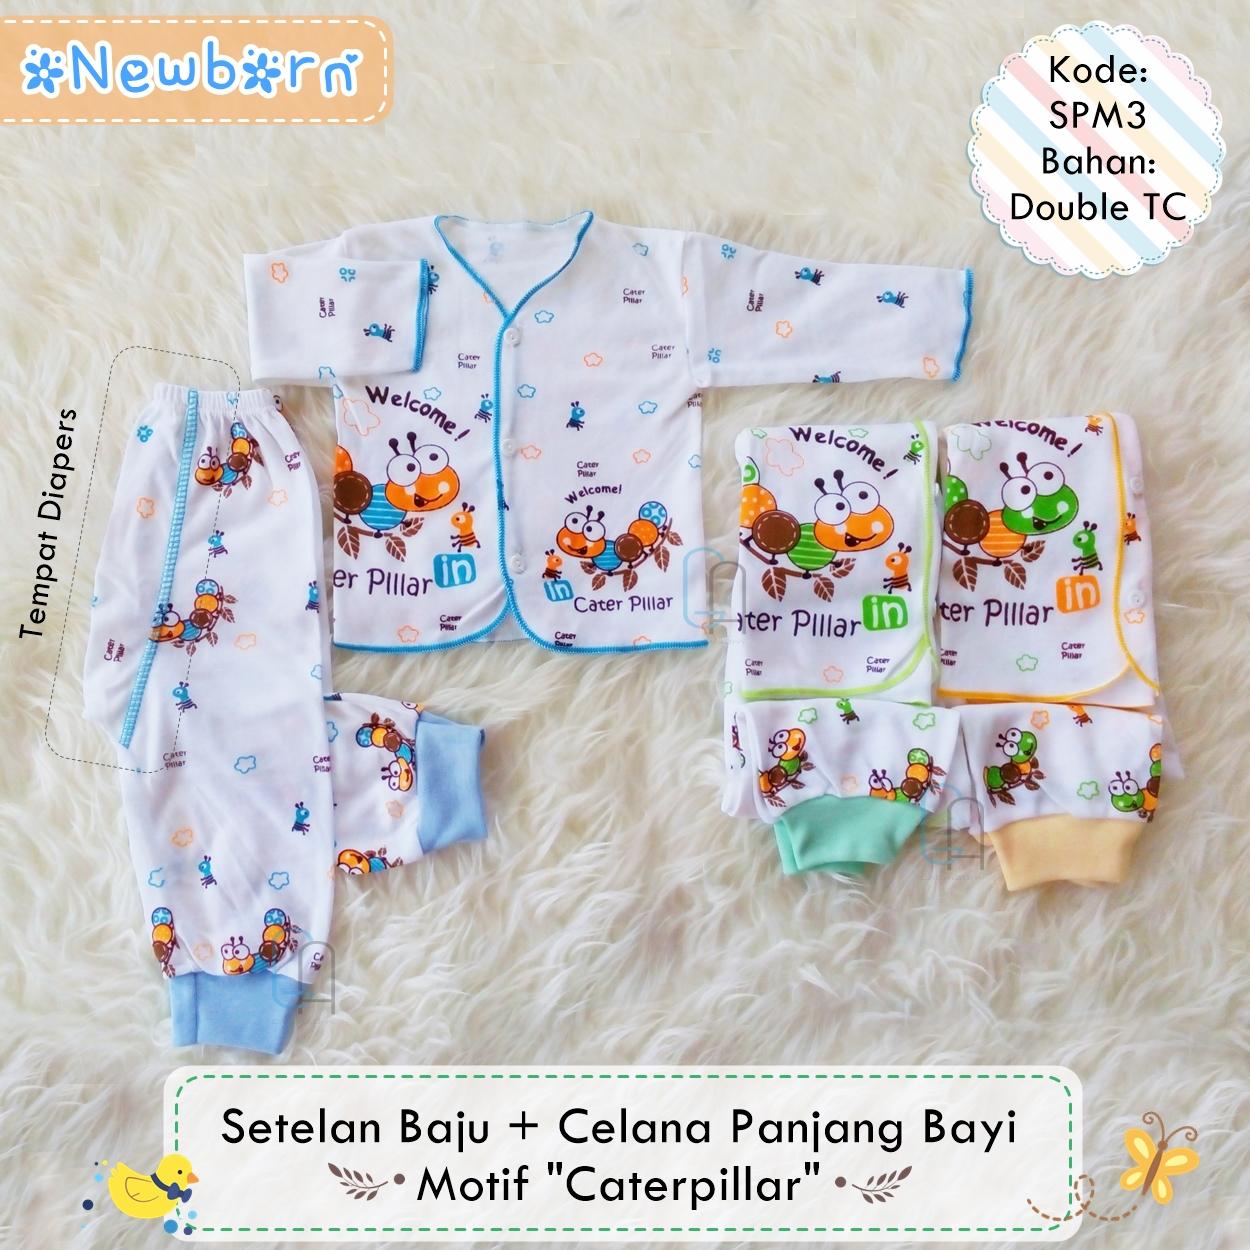 List Harga Baju Bayi Newborn Lucu Terbaru 2018 Cekharga Lengan Panjang 3 Set Setelan Celana Motif